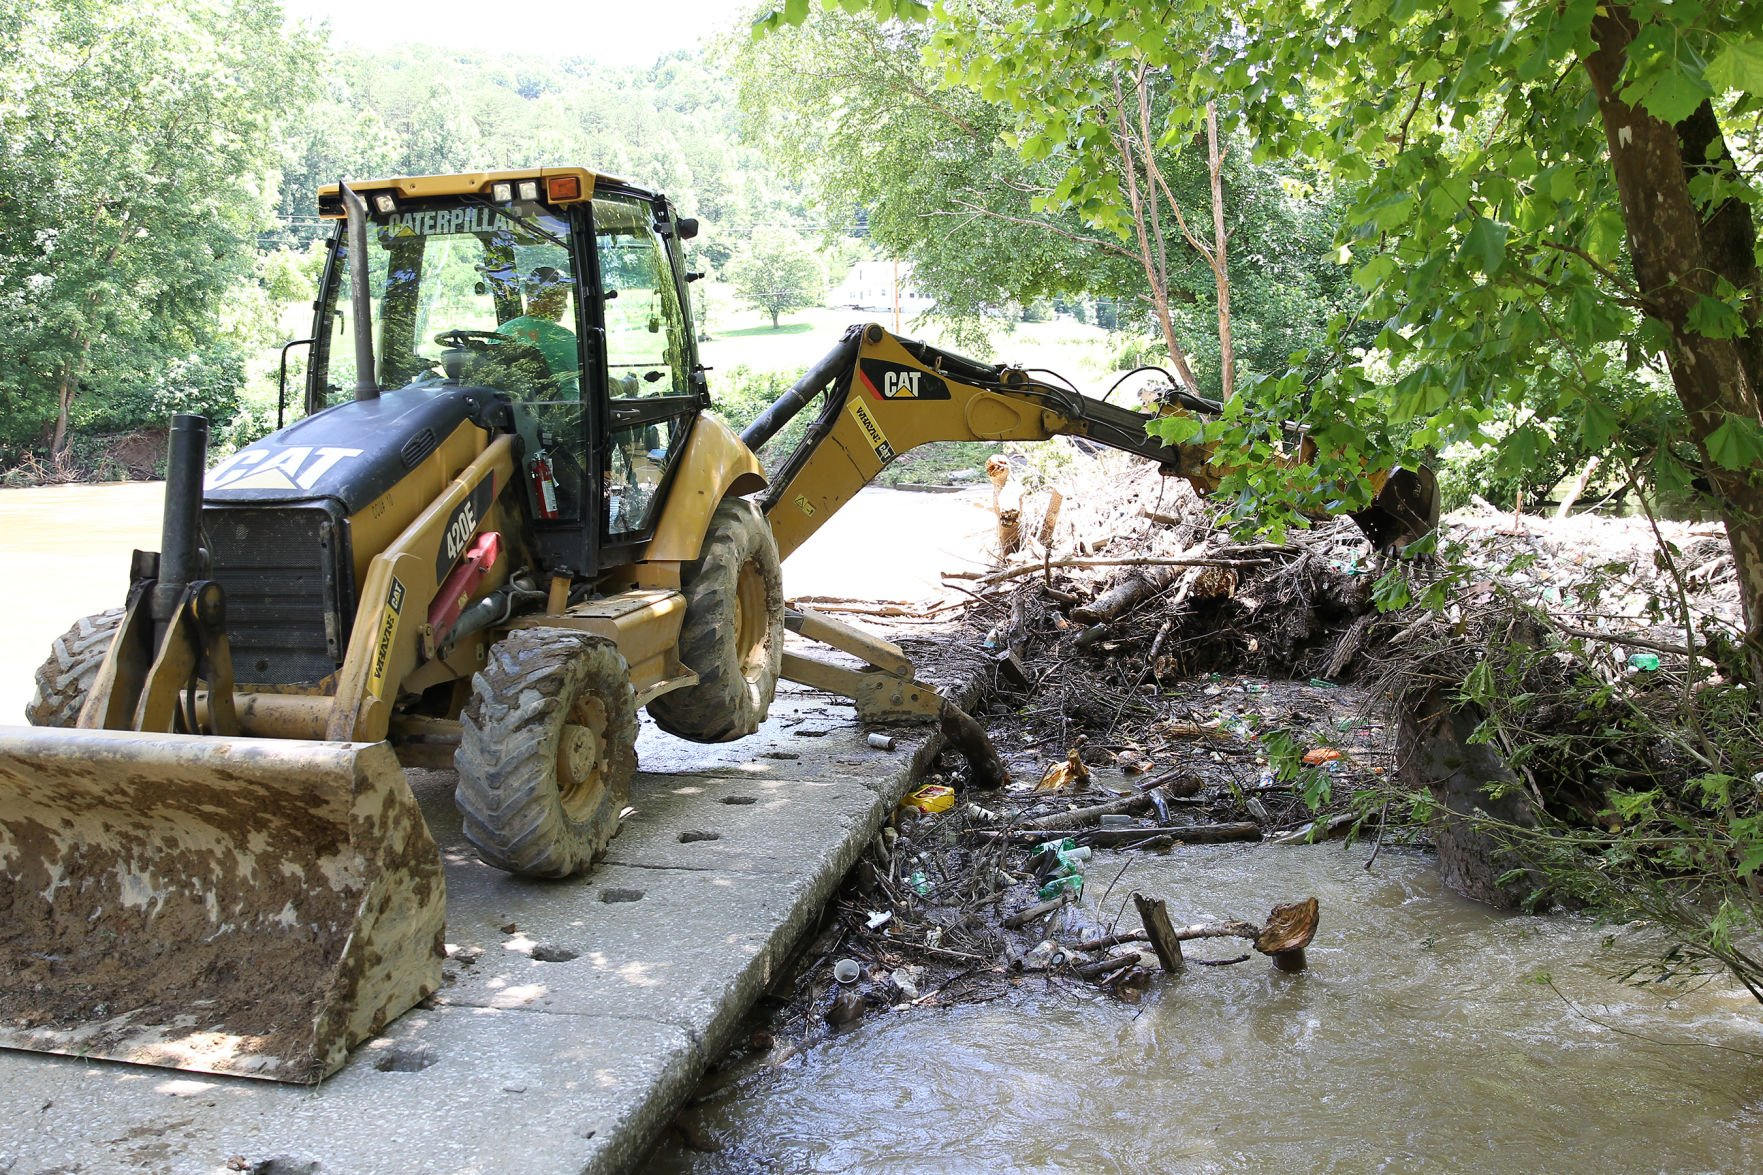 Flood damage nears $1 million dollars